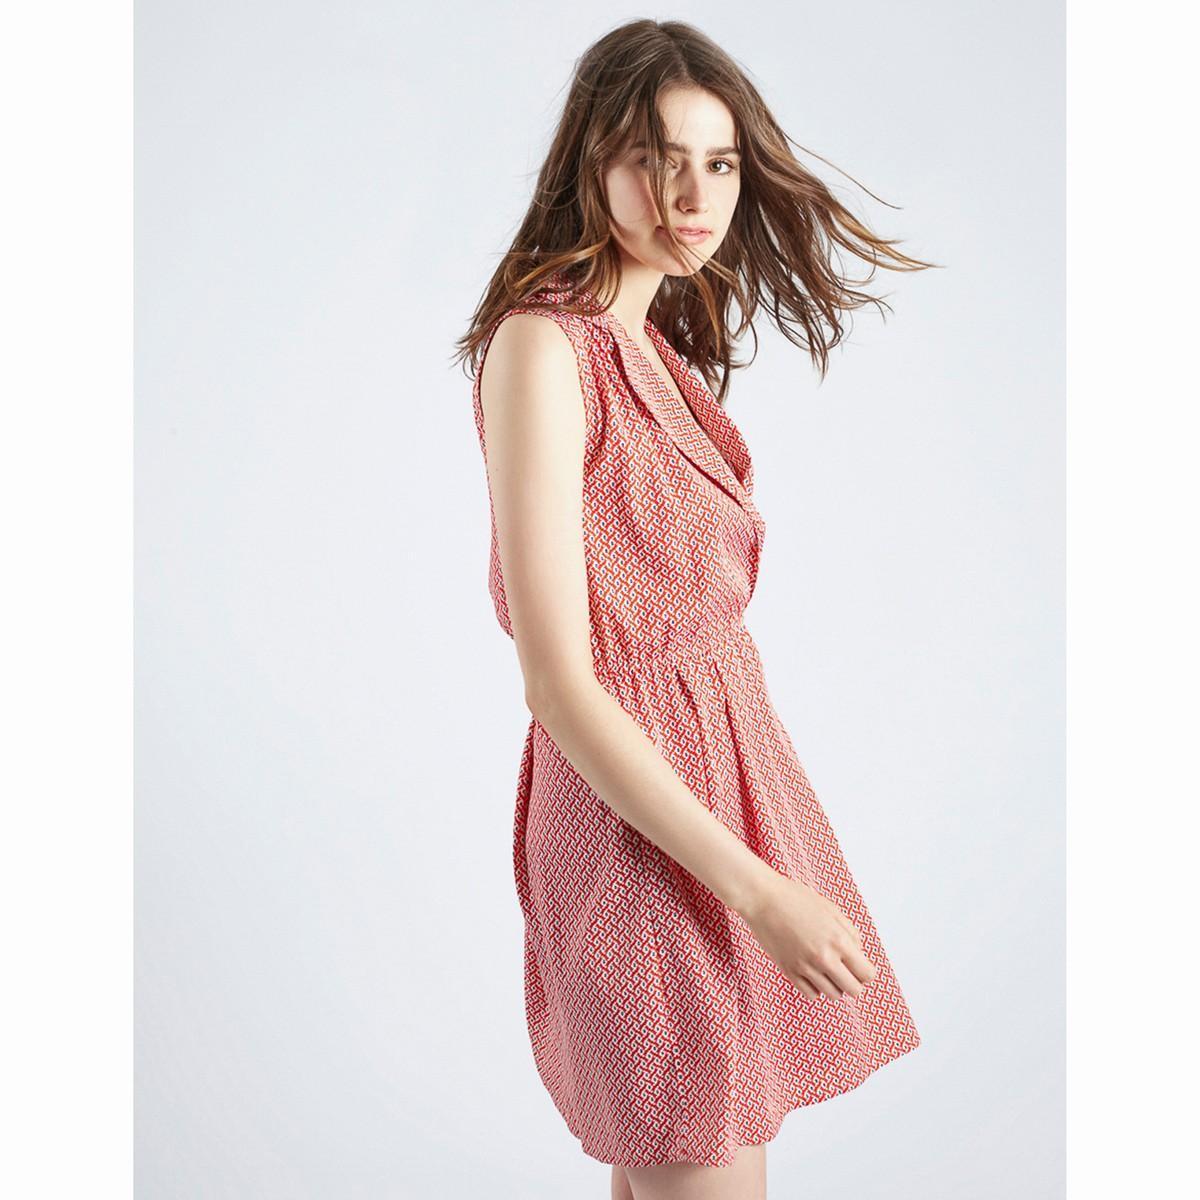 Lyst compania fantastica robe sans manches evasee imprimee for Robe rouge évasée